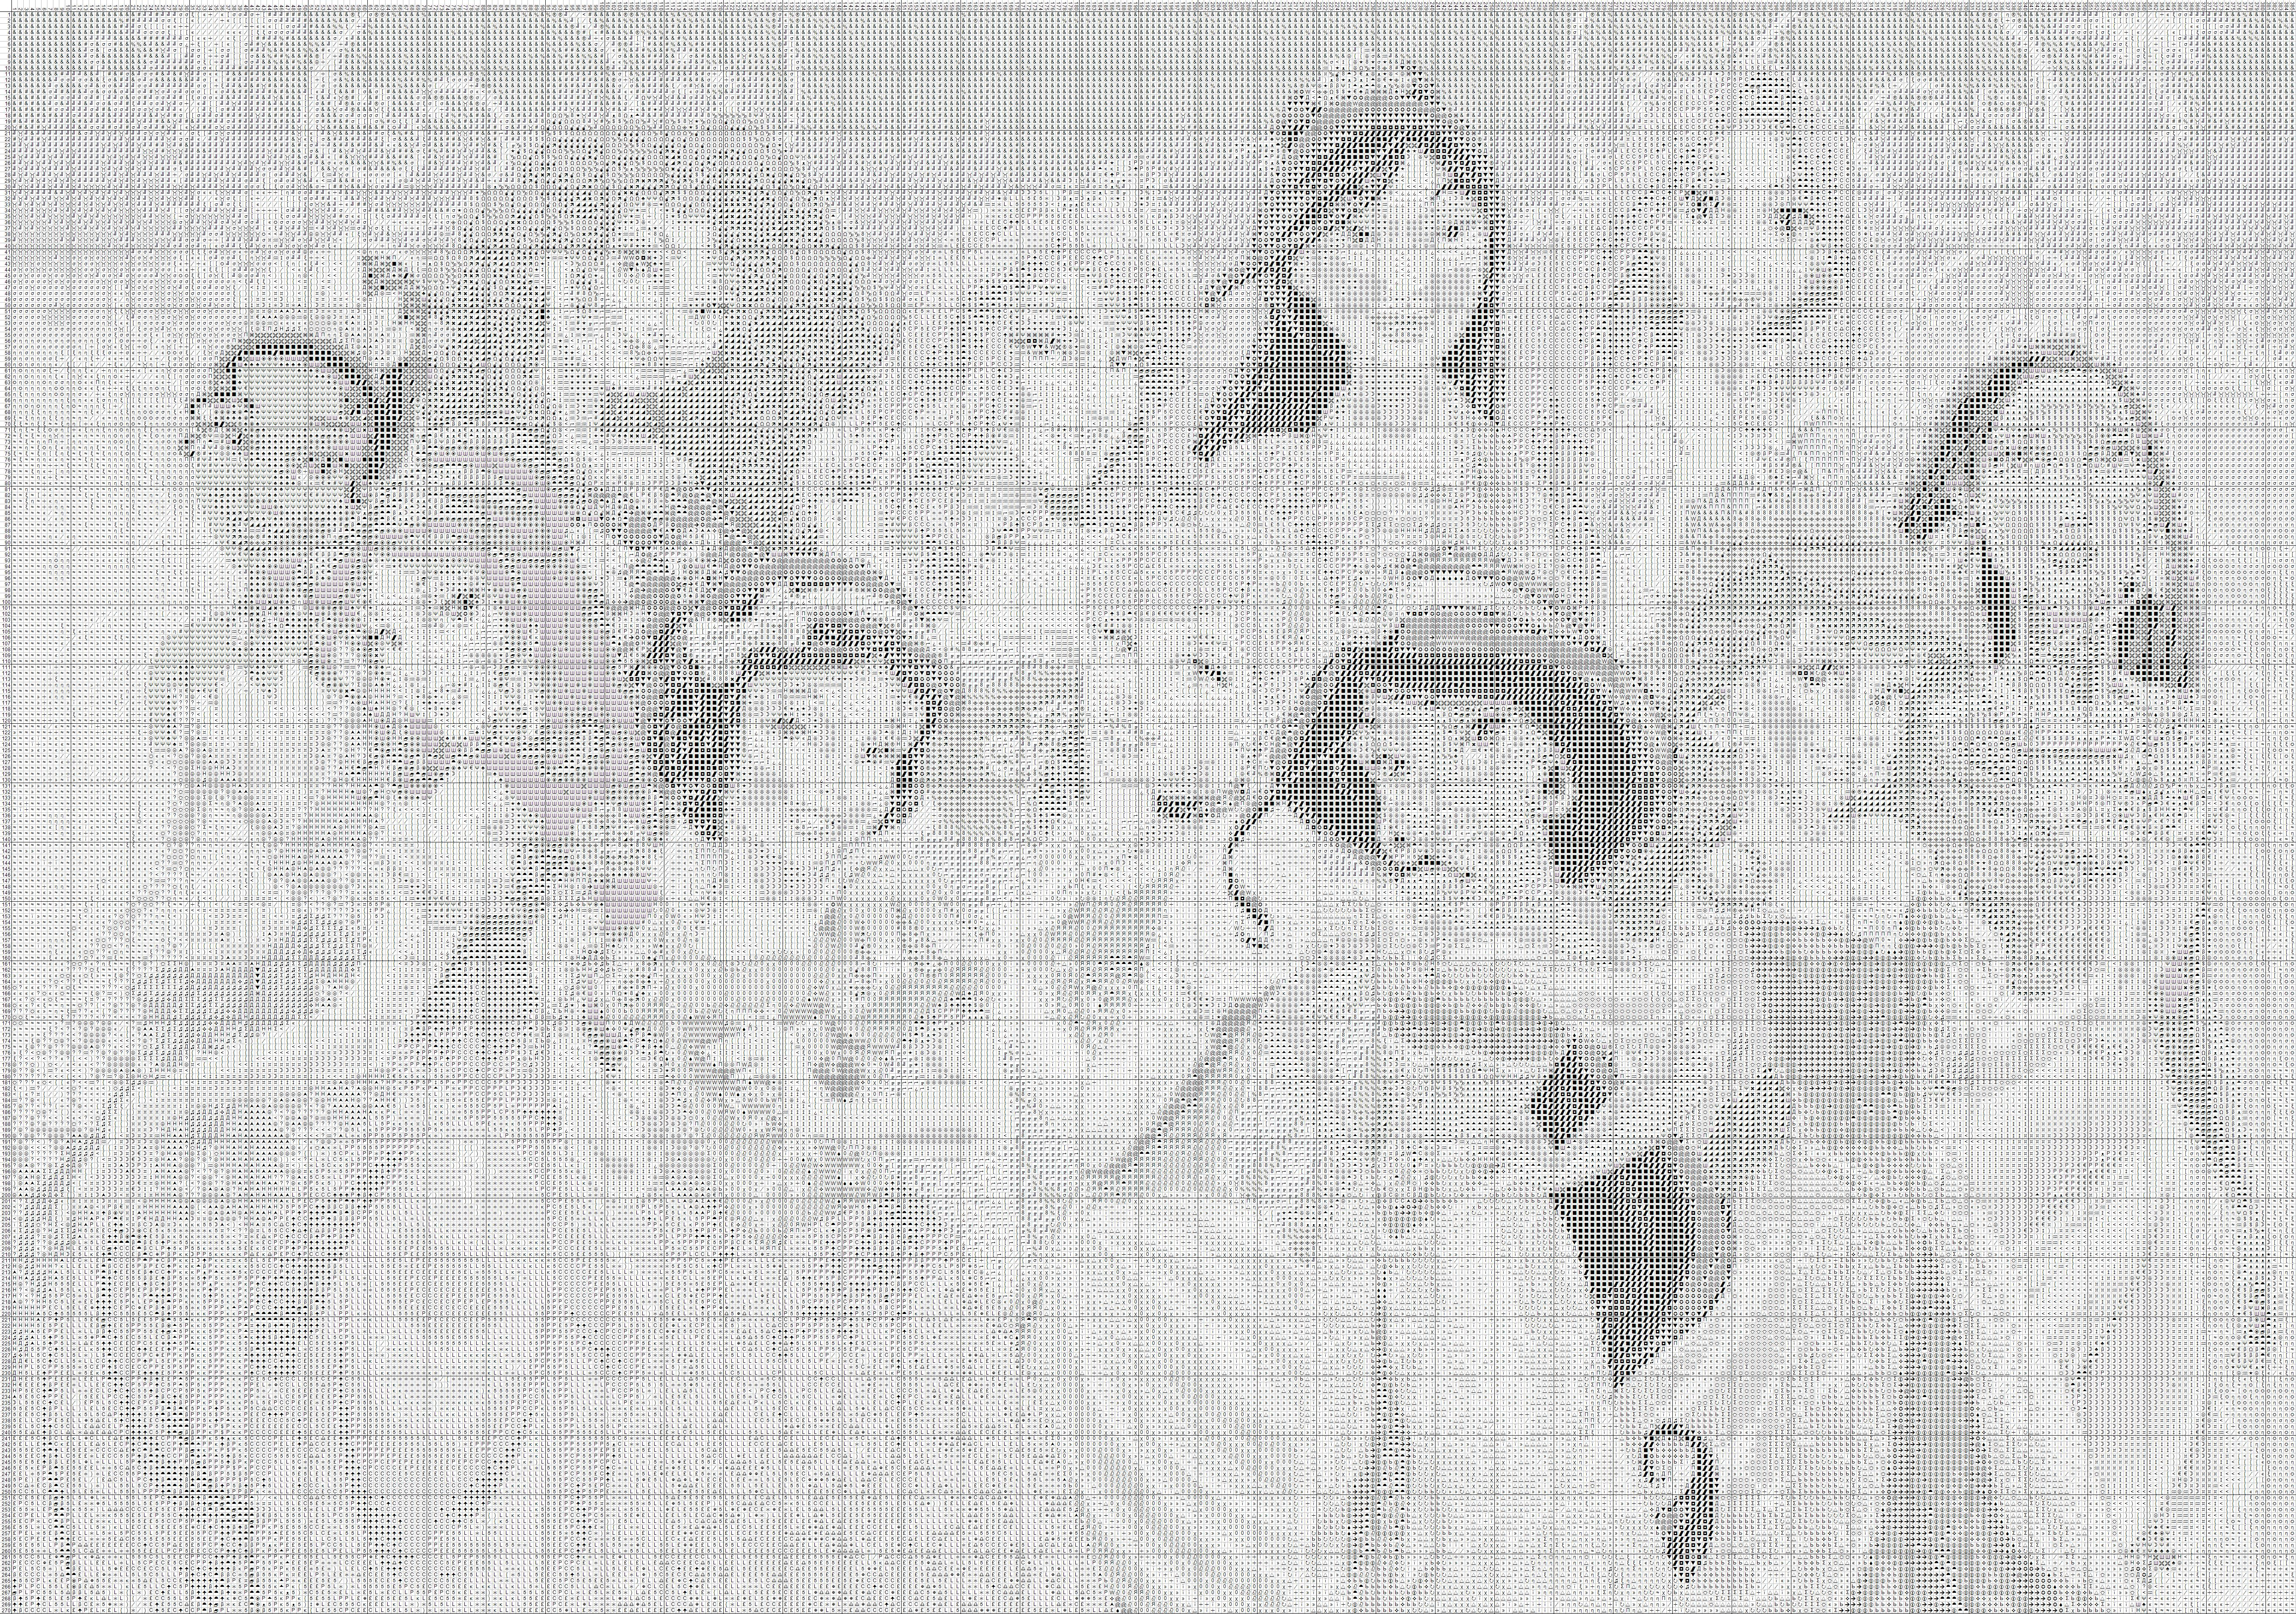 Крестик принцесса схема